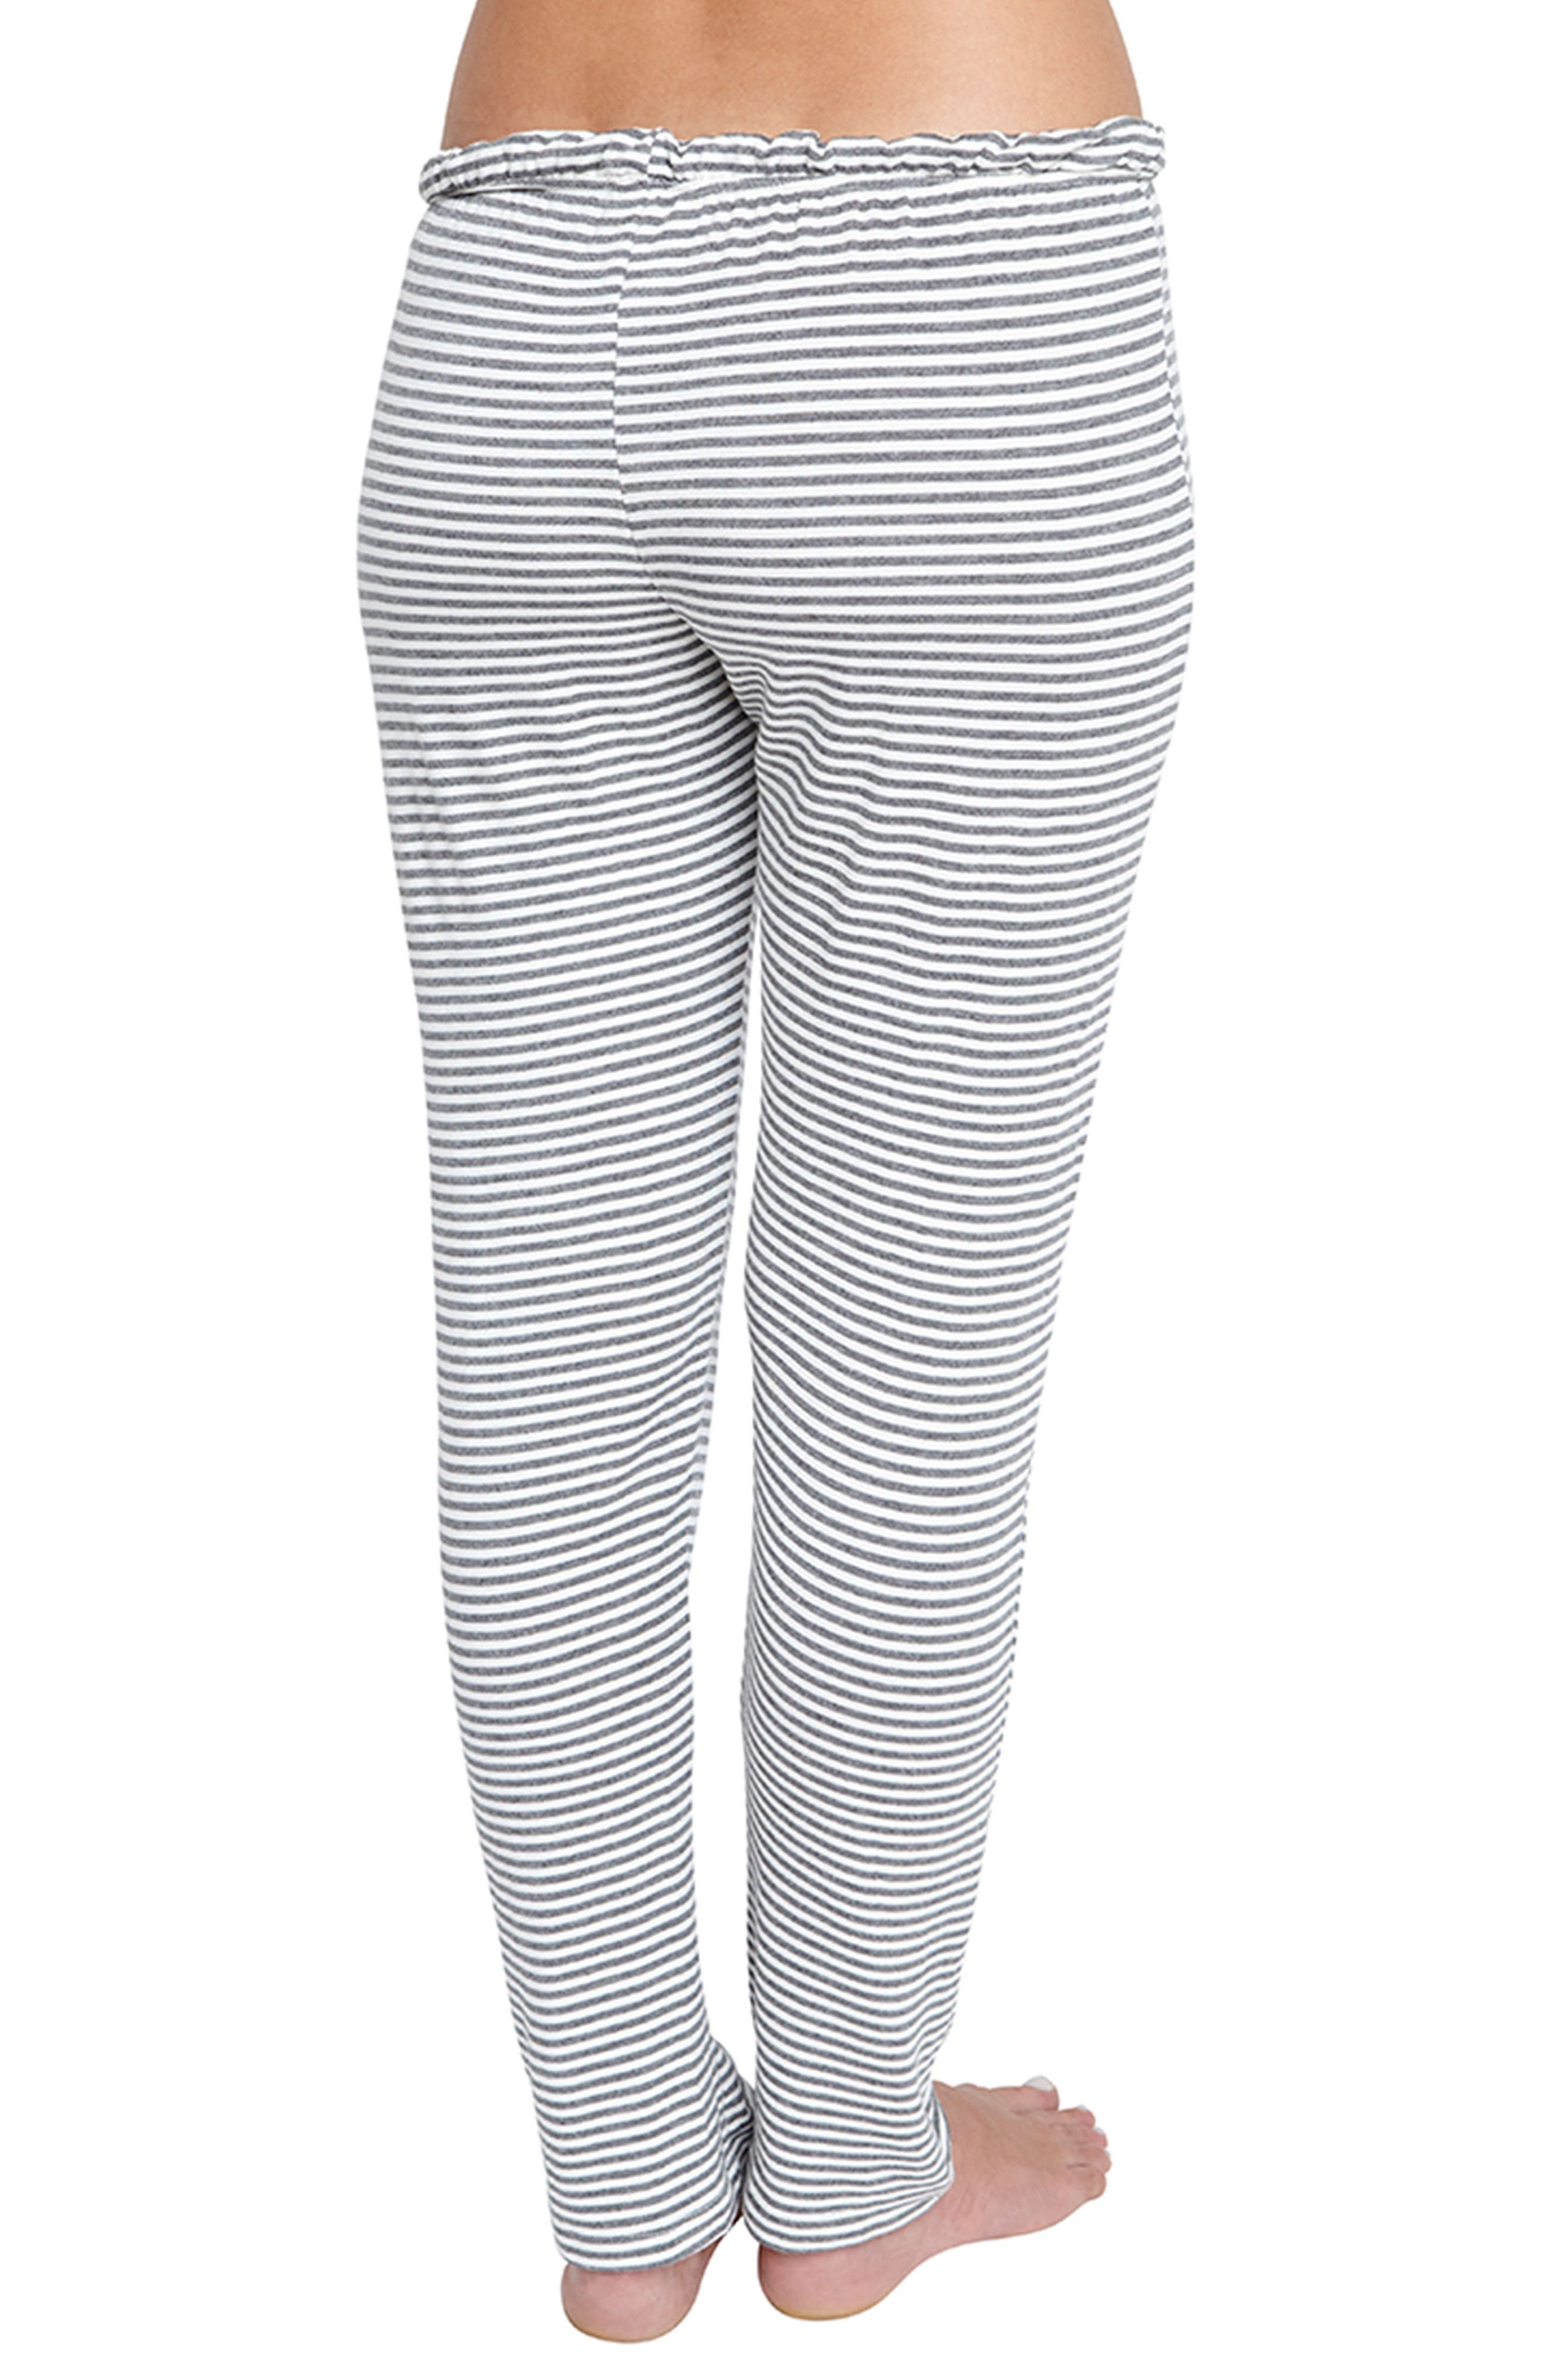 Sadie Stripes Pajama Pants,                             Alternate thumbnail 2, color,                             030